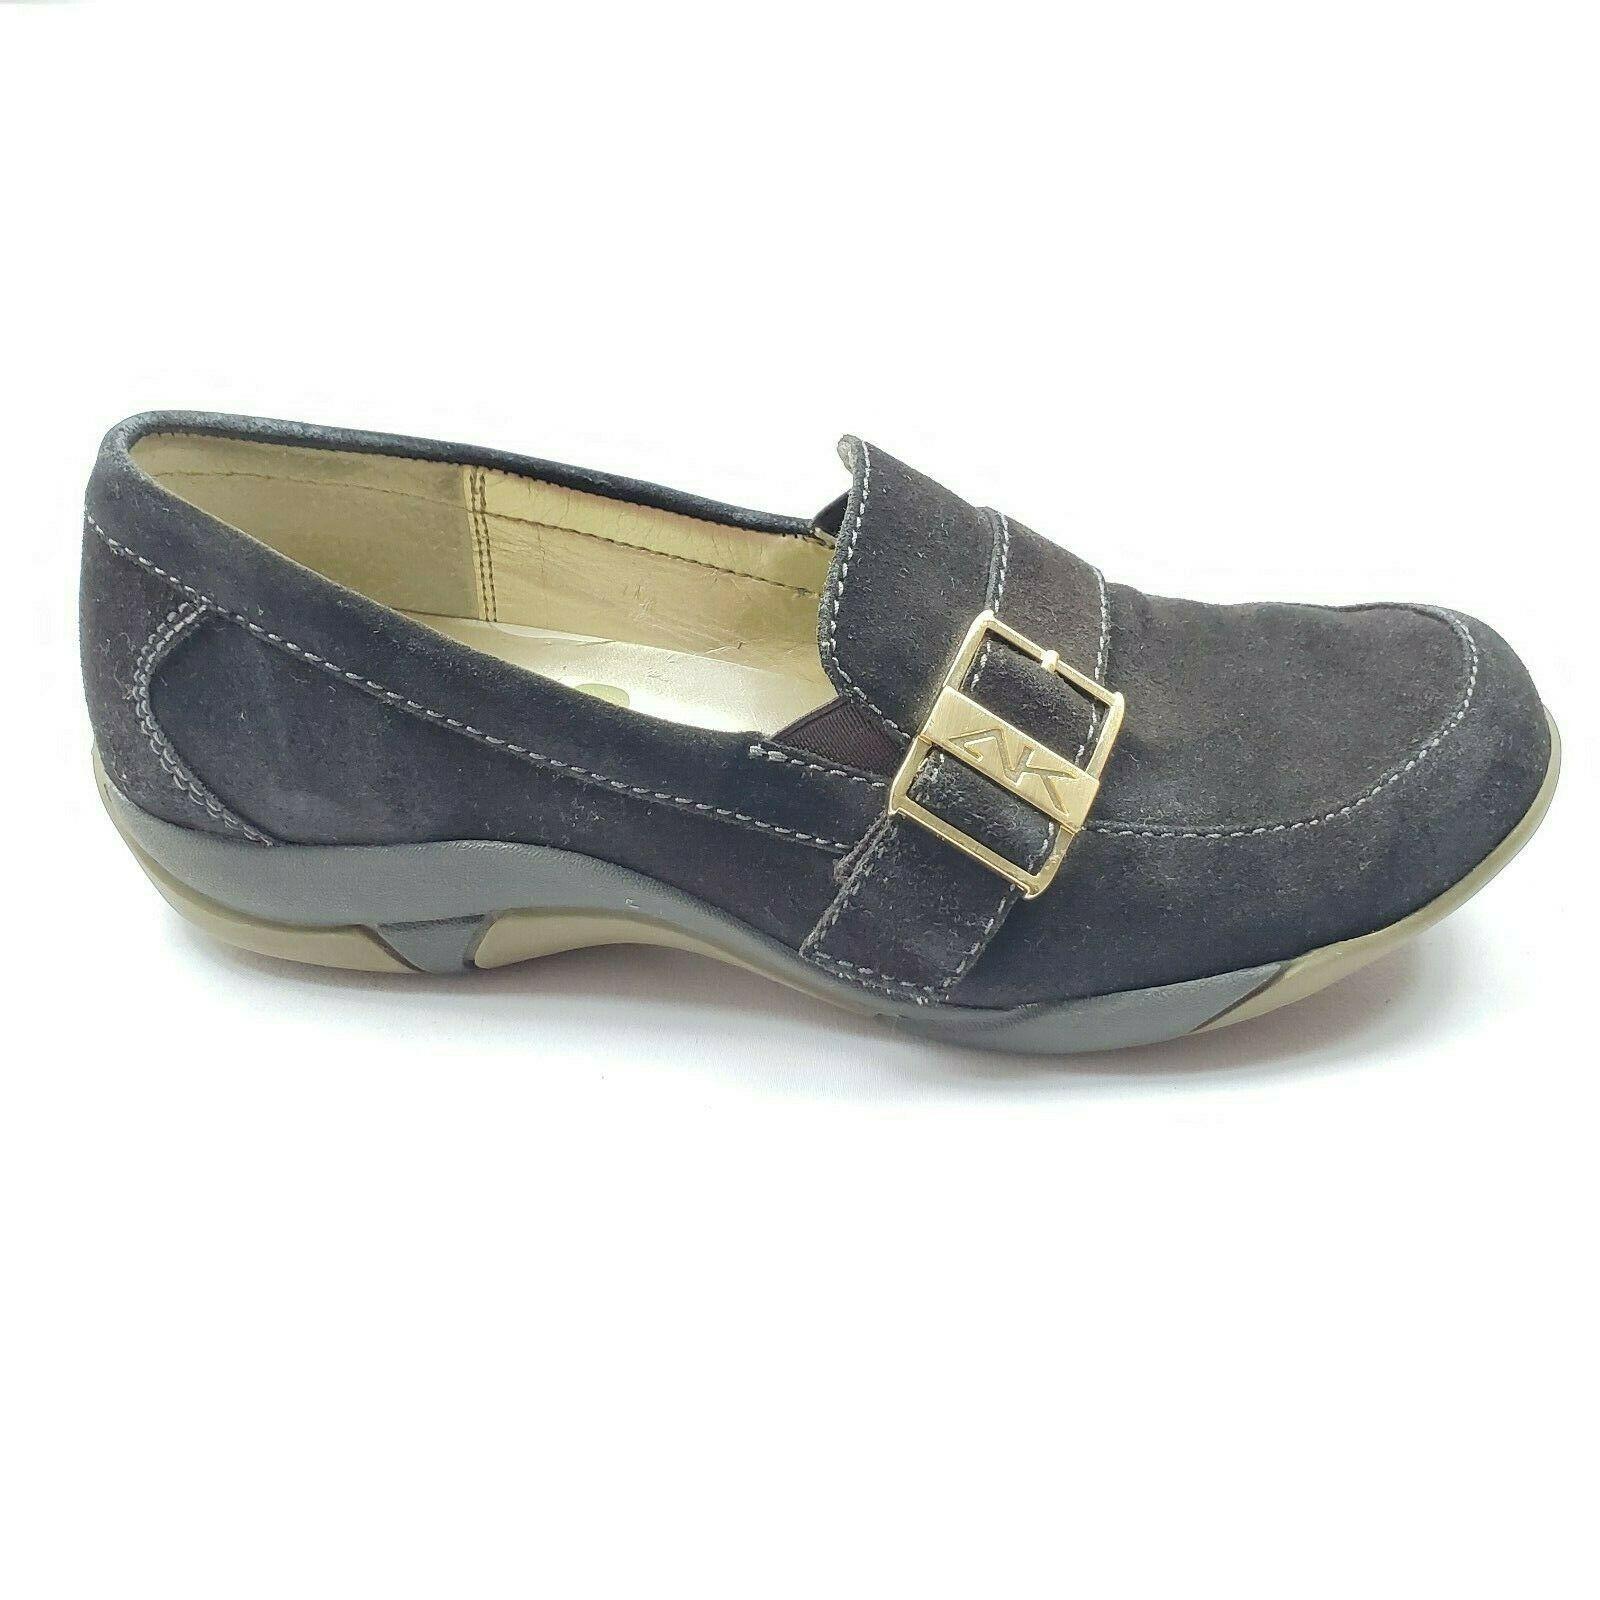 AK Anne Klein Loafers Brown Suede Gold Buckle Women's Size 8 - $17.34